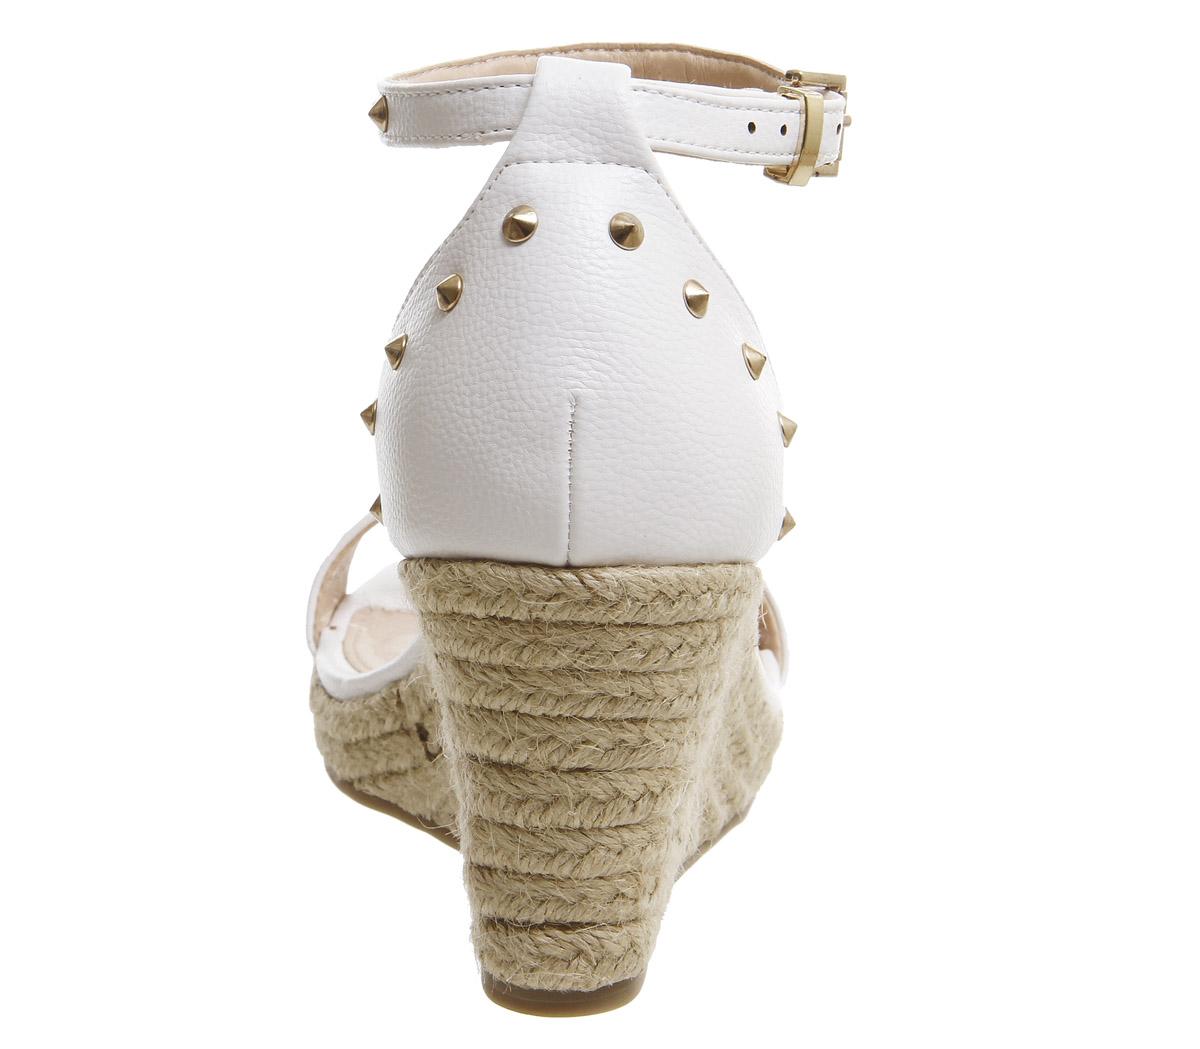 Damenschuhe Office Music Studded Wedge Espadrilles Weiß Weiß Espadrilles Heels 68911f